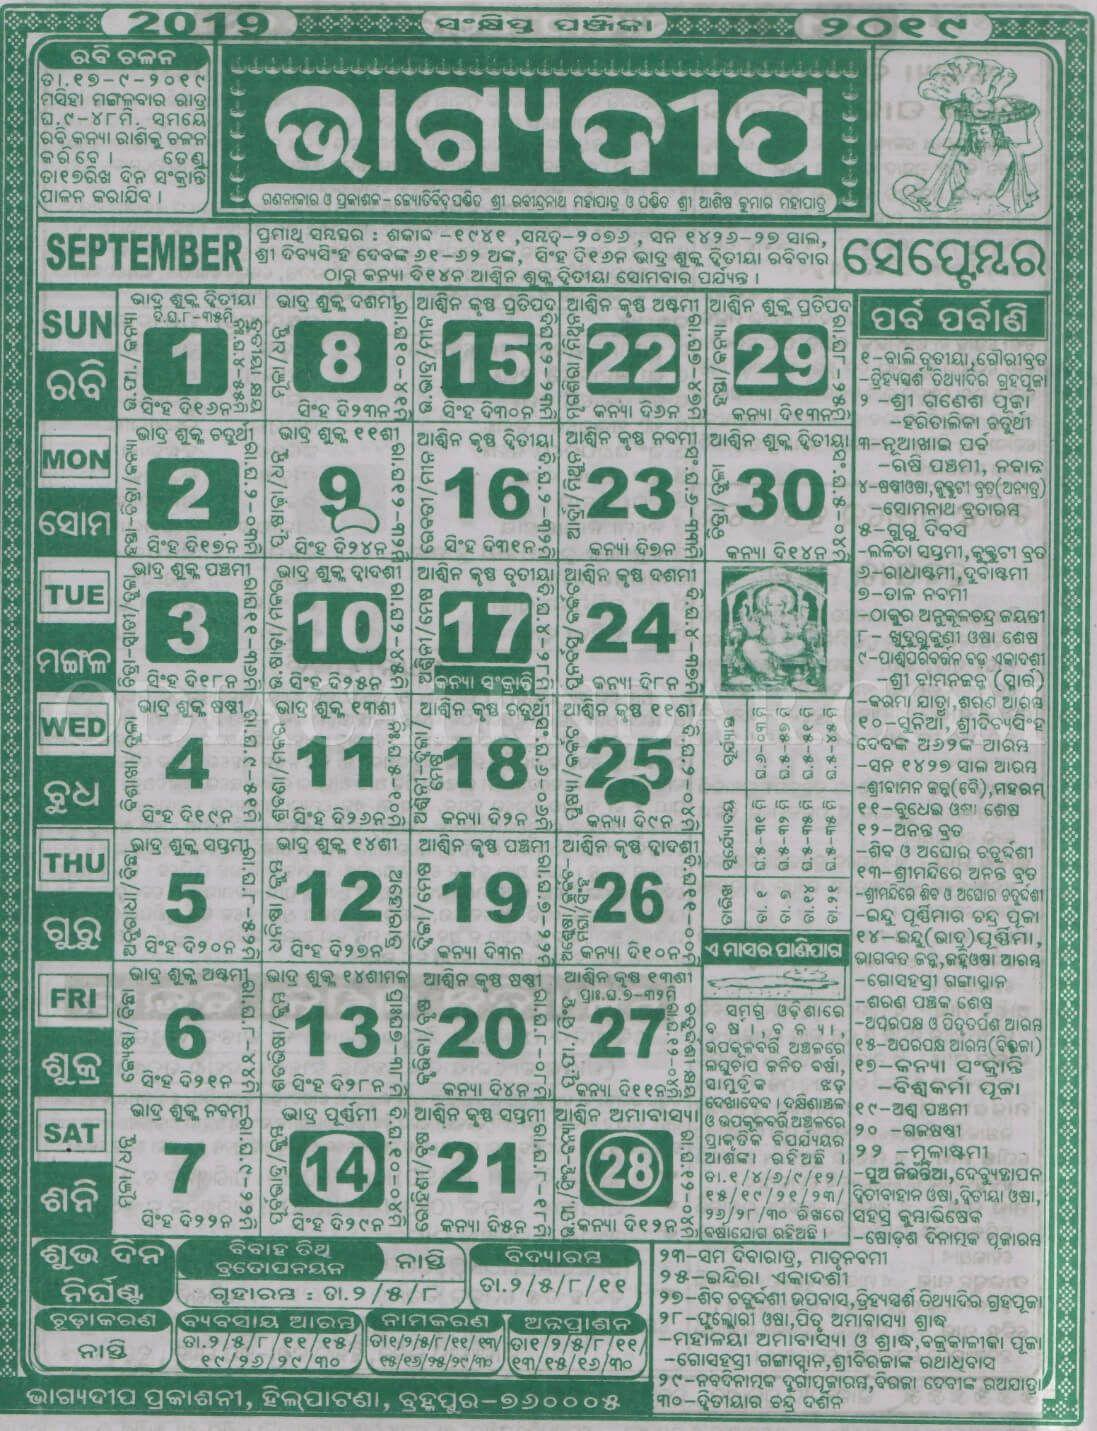 Bhagyadeep Calendar September 2019 | Calendar, App, December with regard to Odia Calendar Bhagyadeep